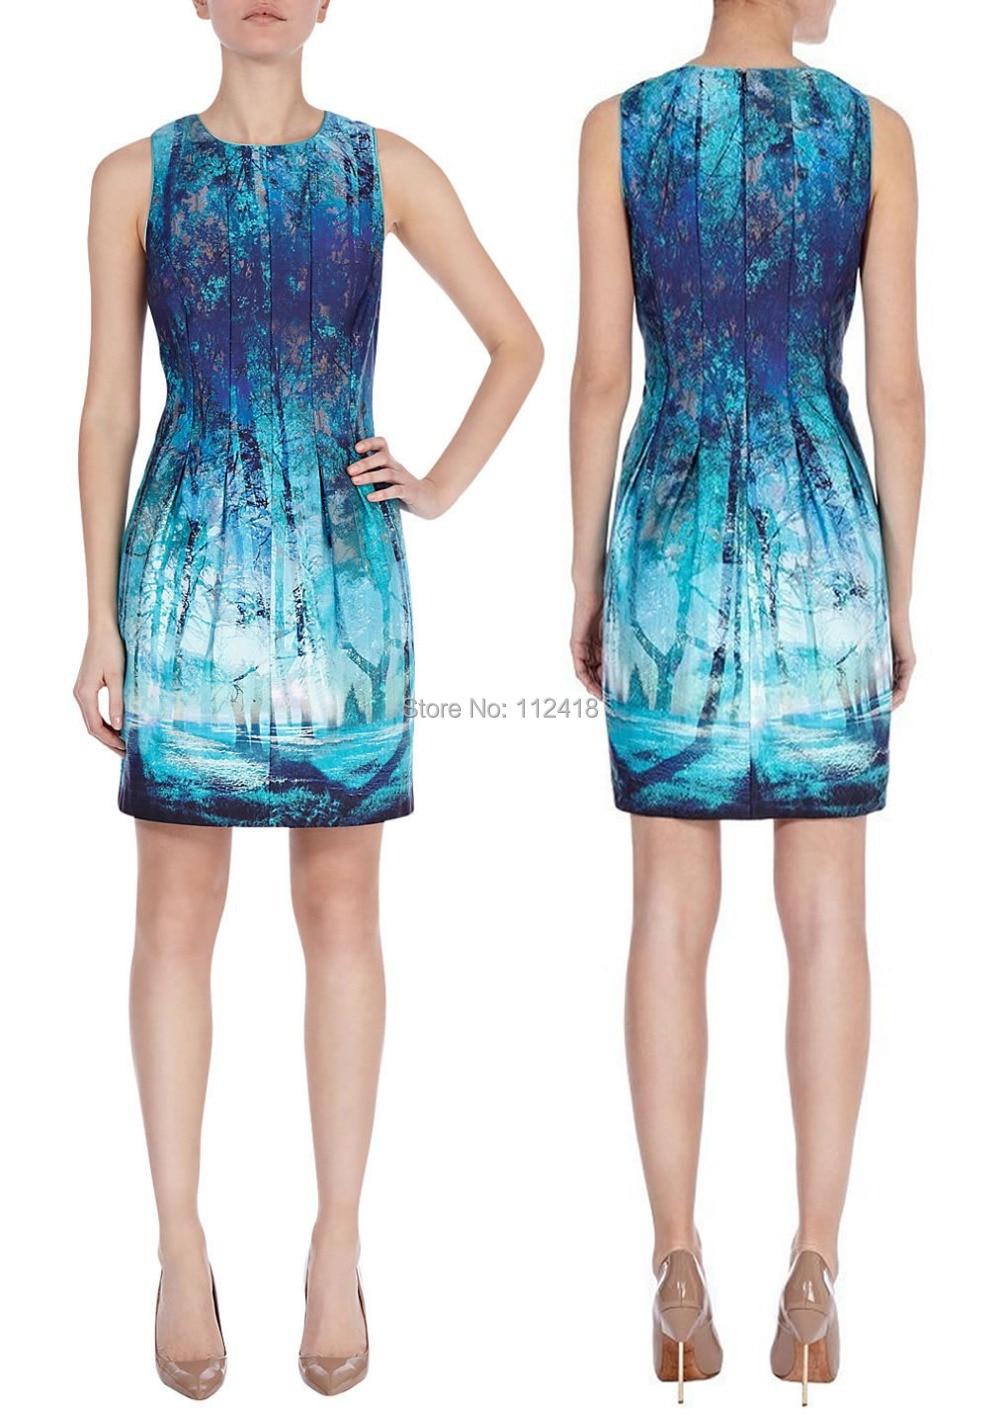 Fashion Print Women Macie Dress Elegant Draped Party Dresses 1487-in ...